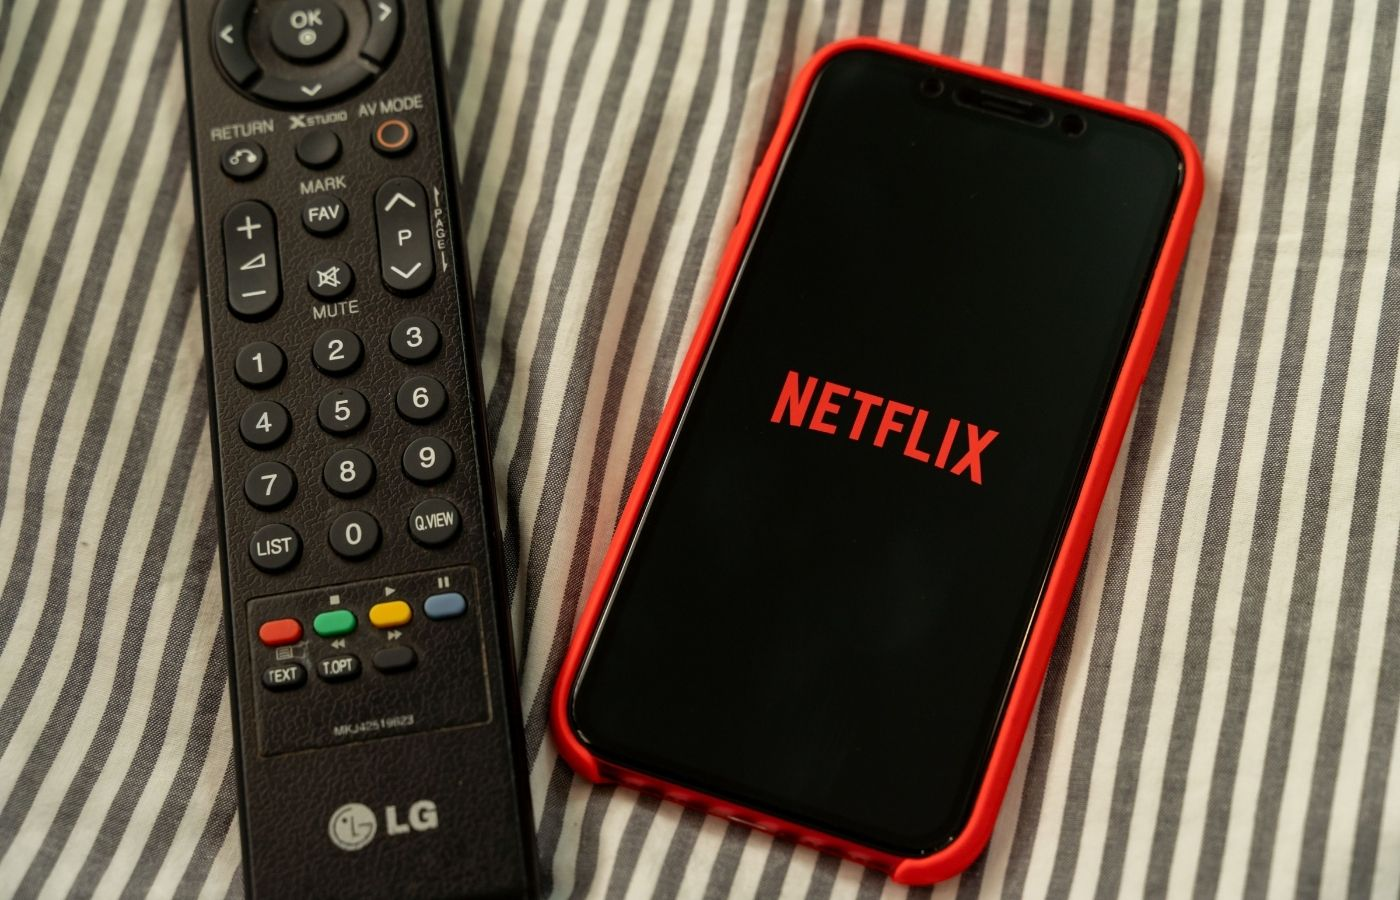 Netflix & sport Dokumenty o sportu a sportovcích | Sportbiz